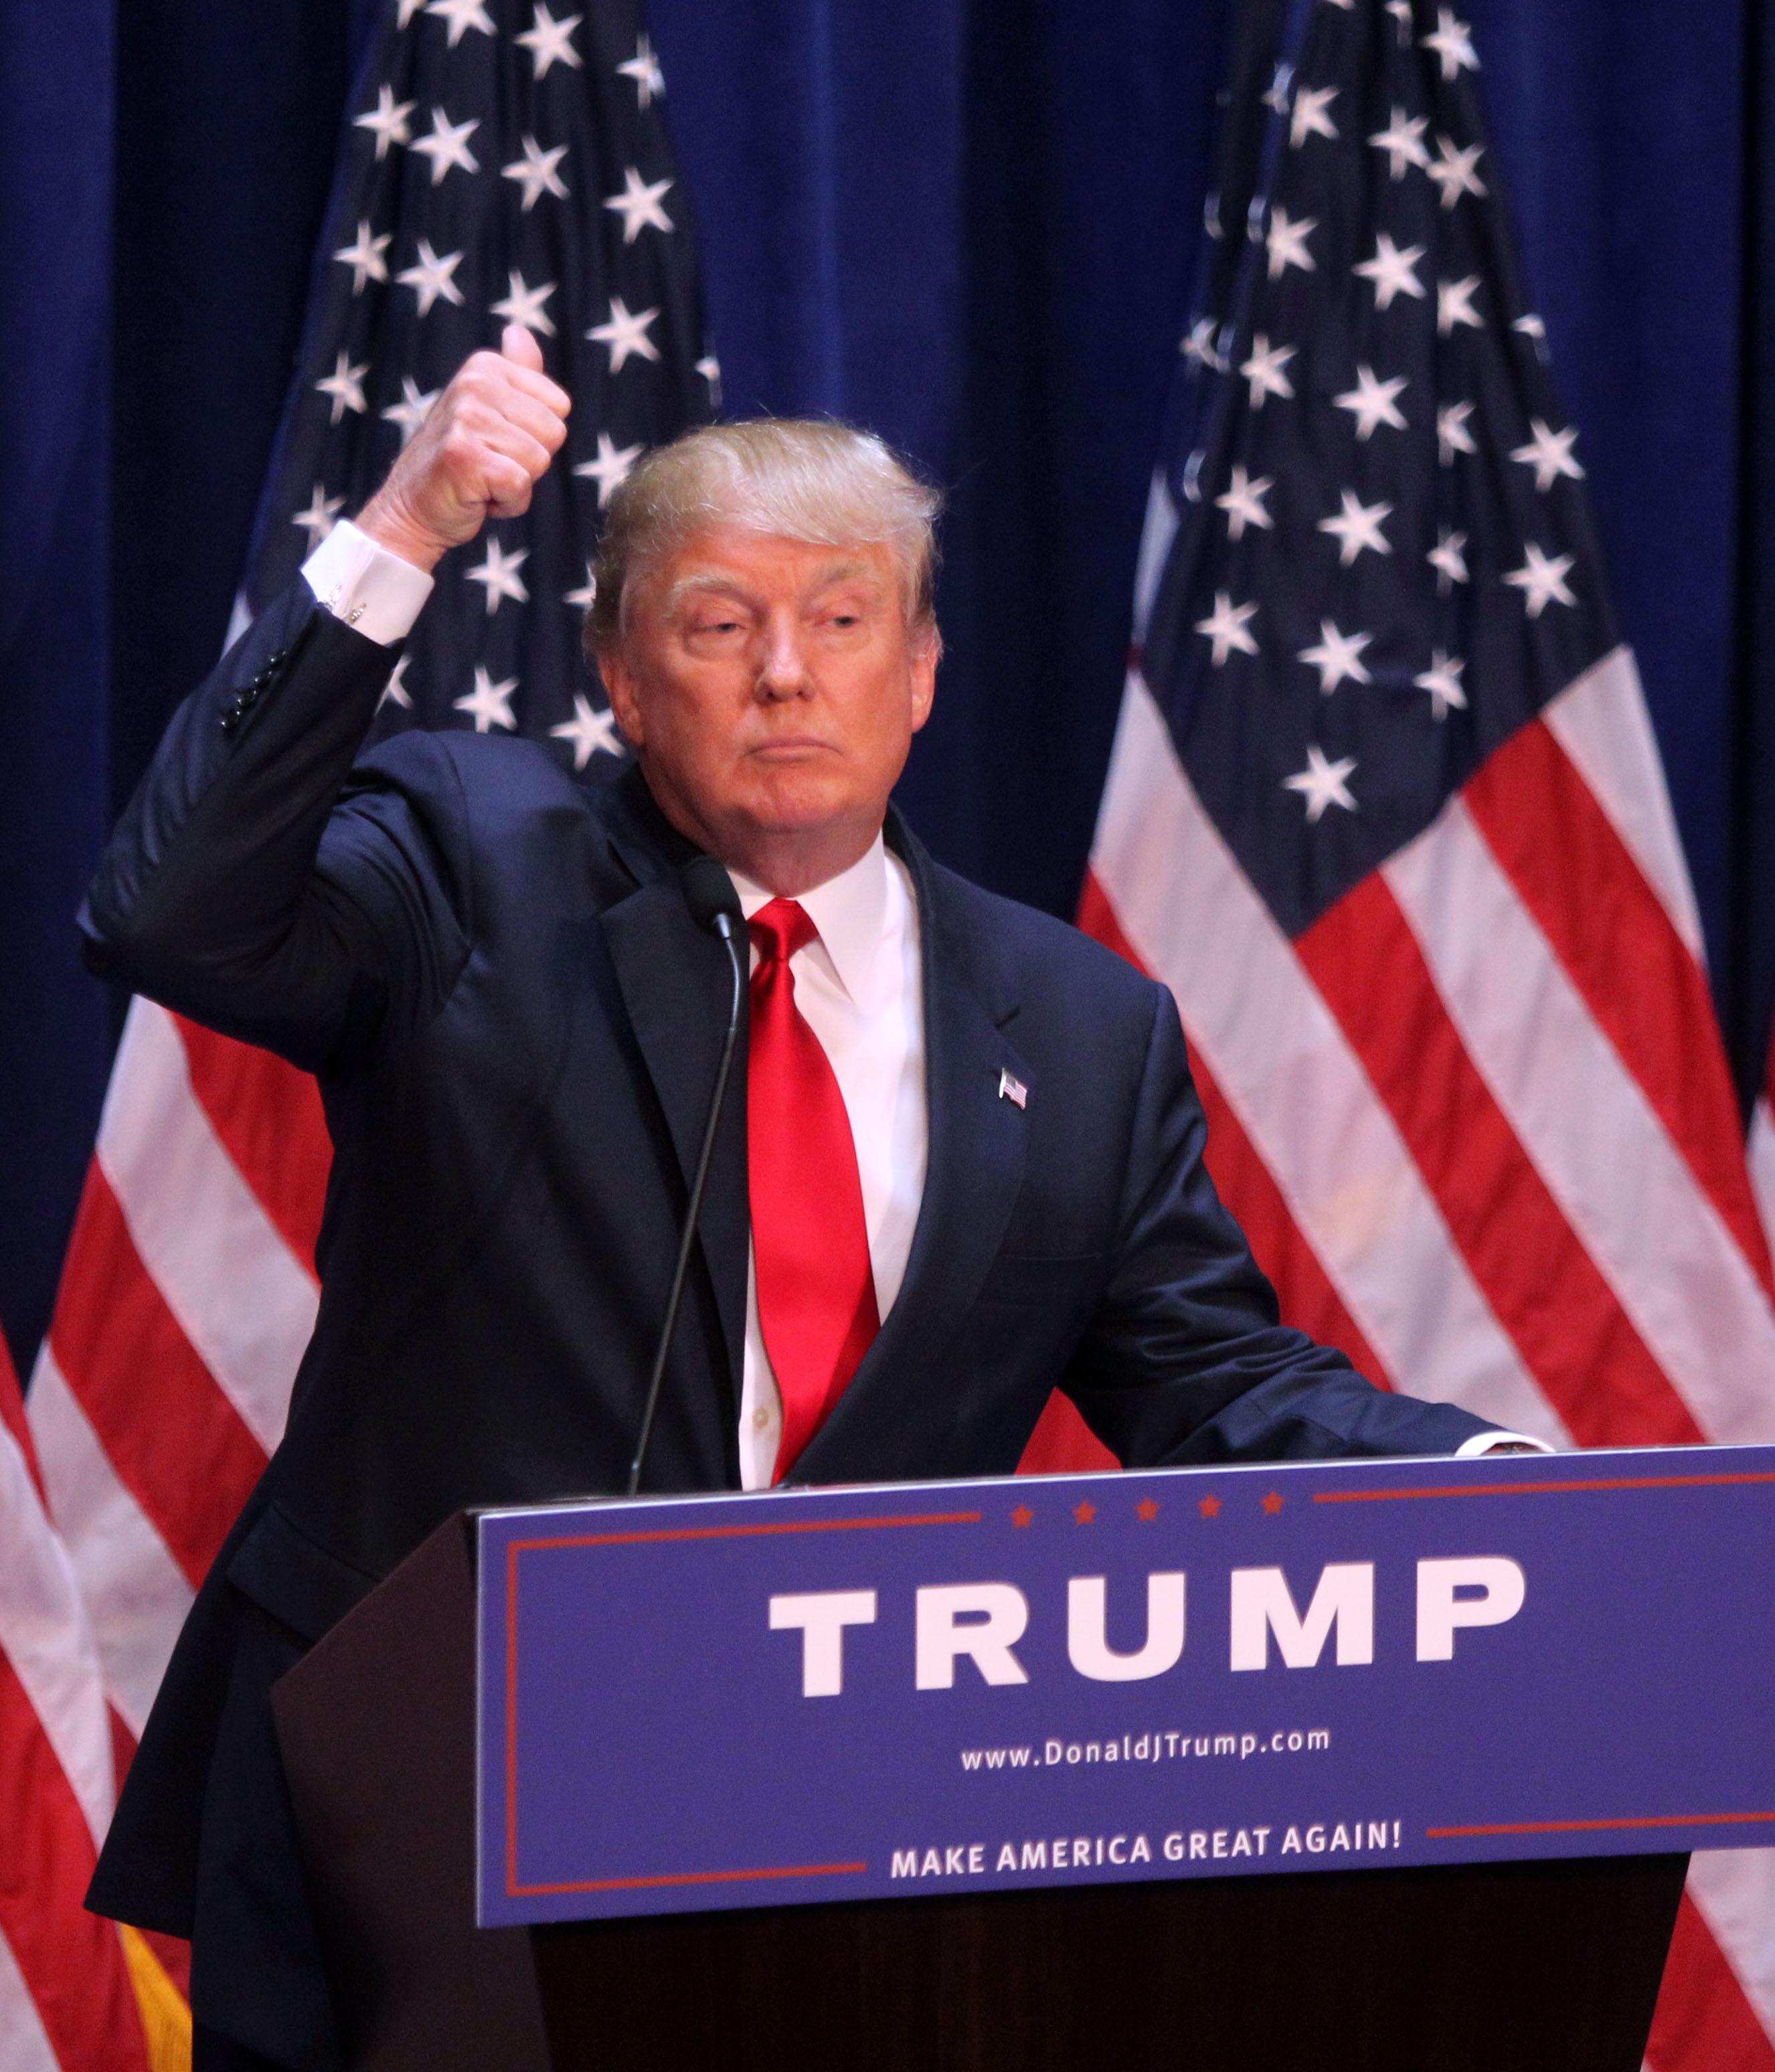 Donald Trump Presidential Announcement